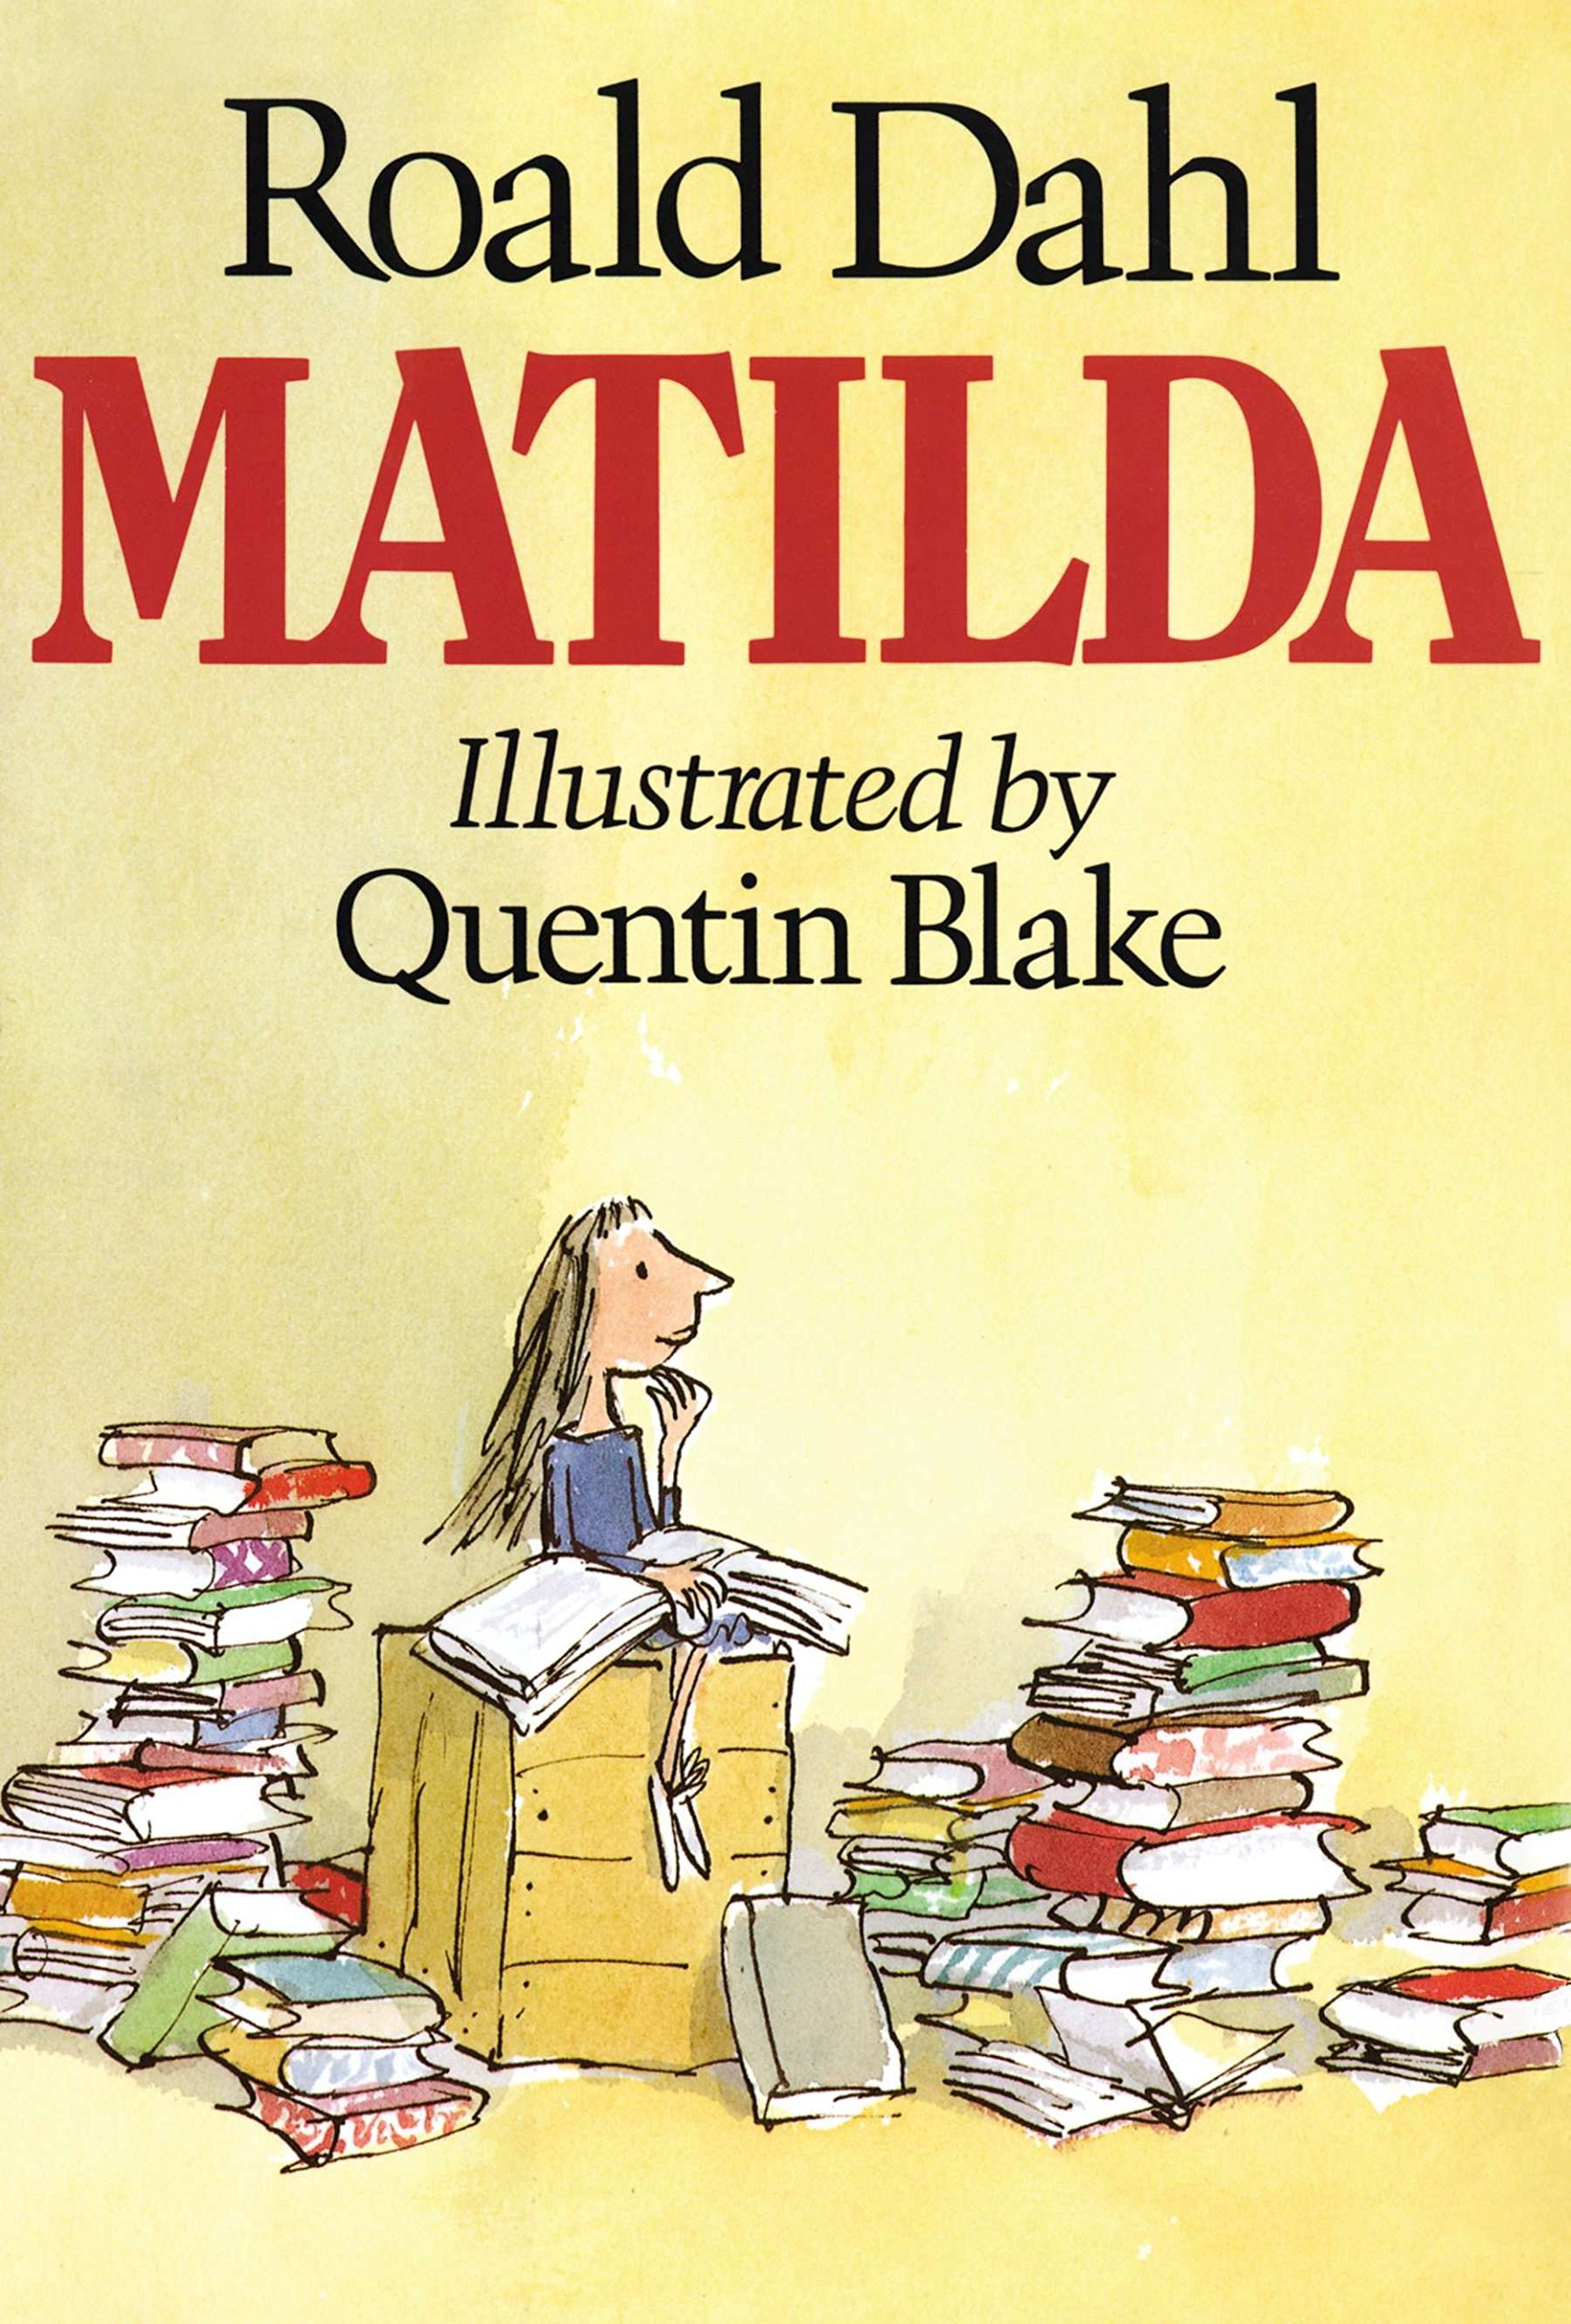 Matilda: Dahl, Roald, Blake, Quentin: 9780670824397: Amazon.com: Books